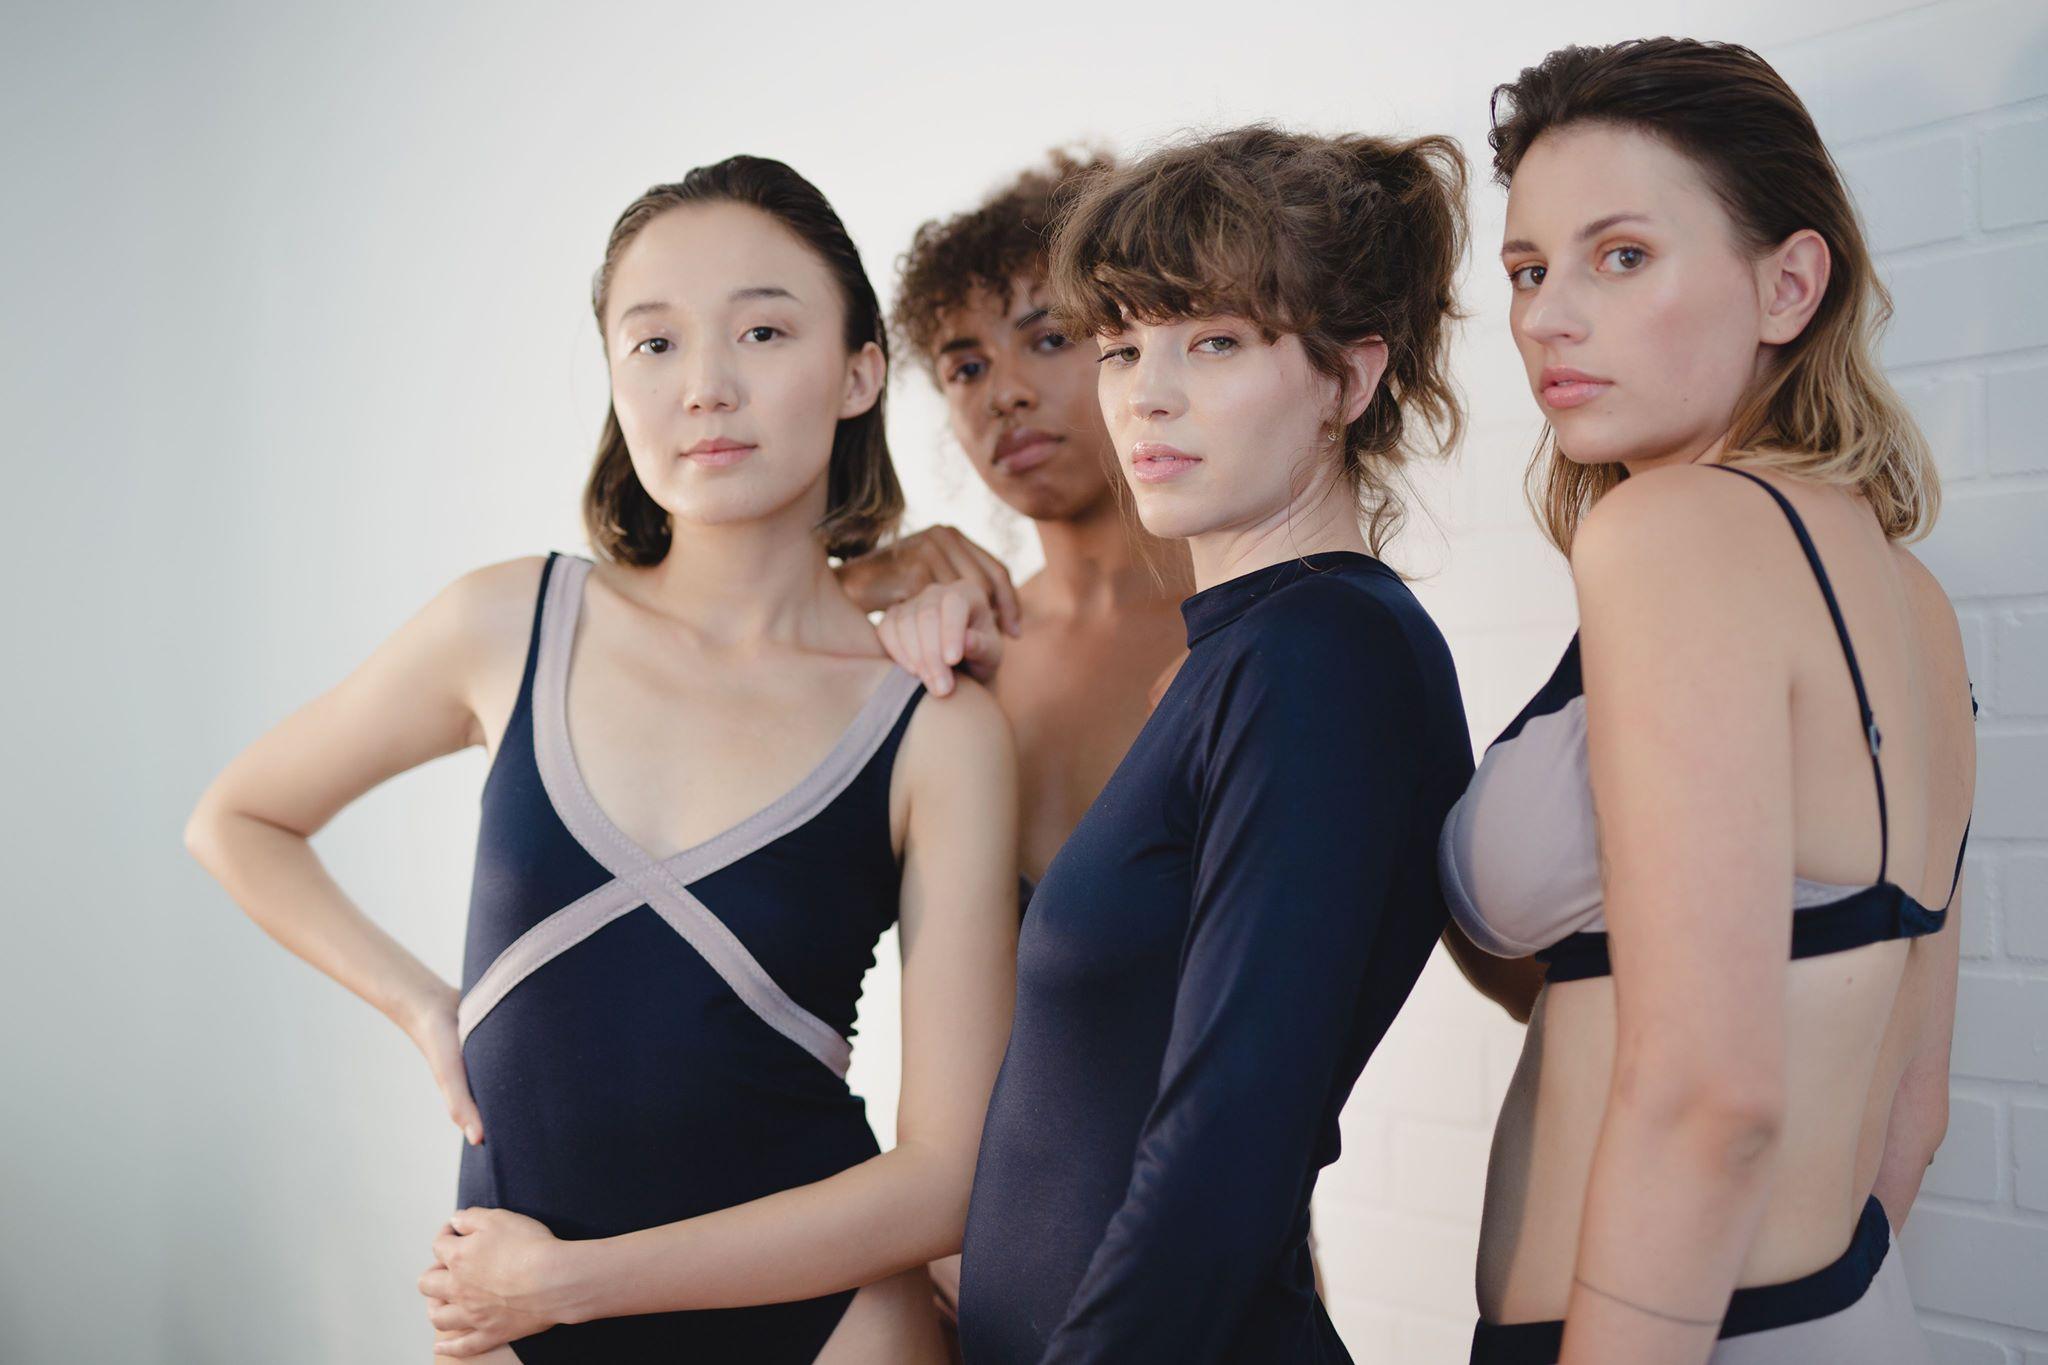 ©️ Frau Rabe  Models: Altyn (@danslasteppe), Sarah (@twoxchromosomed), Lila(@overoceans) and Coco (@cocoelane)